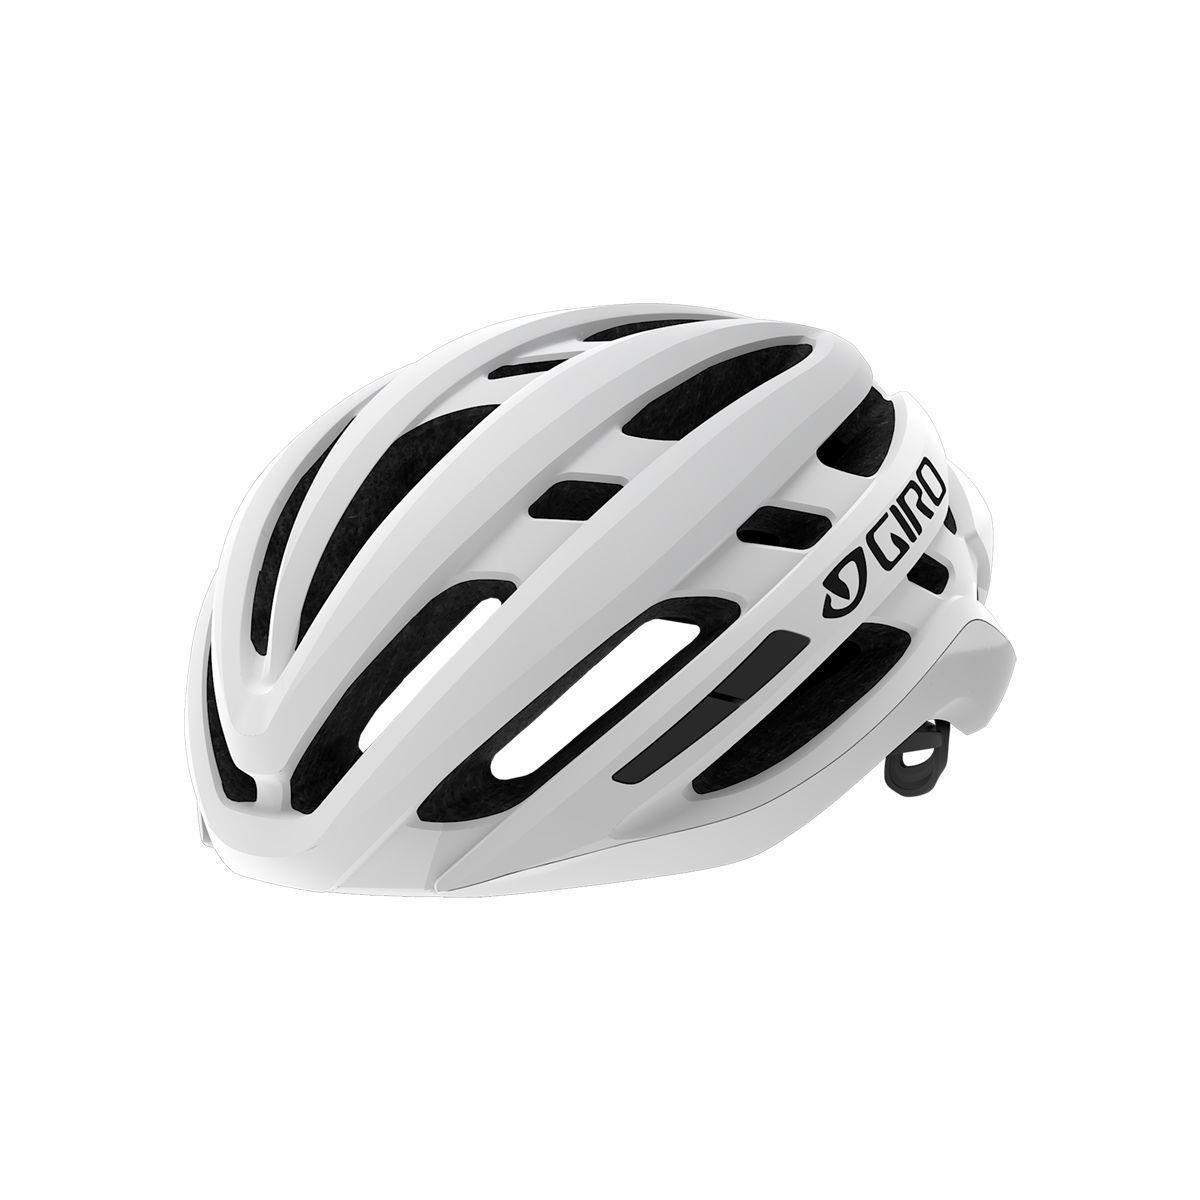 Helmet Agilis MIPS White 2021 Size S (51-55cm)